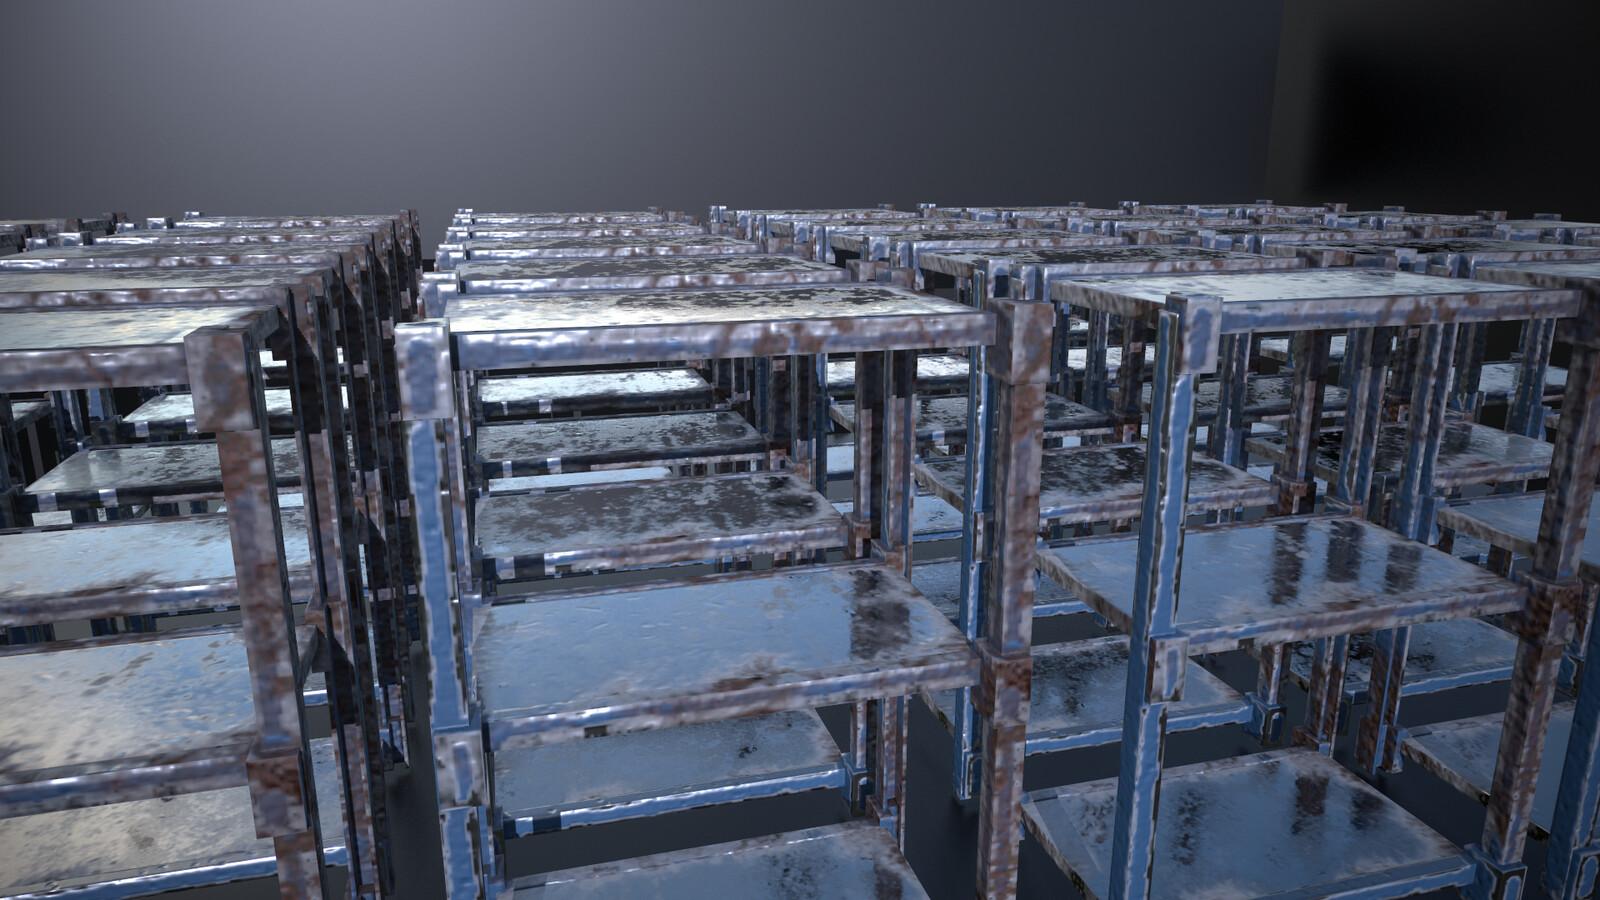 Metallic shelving